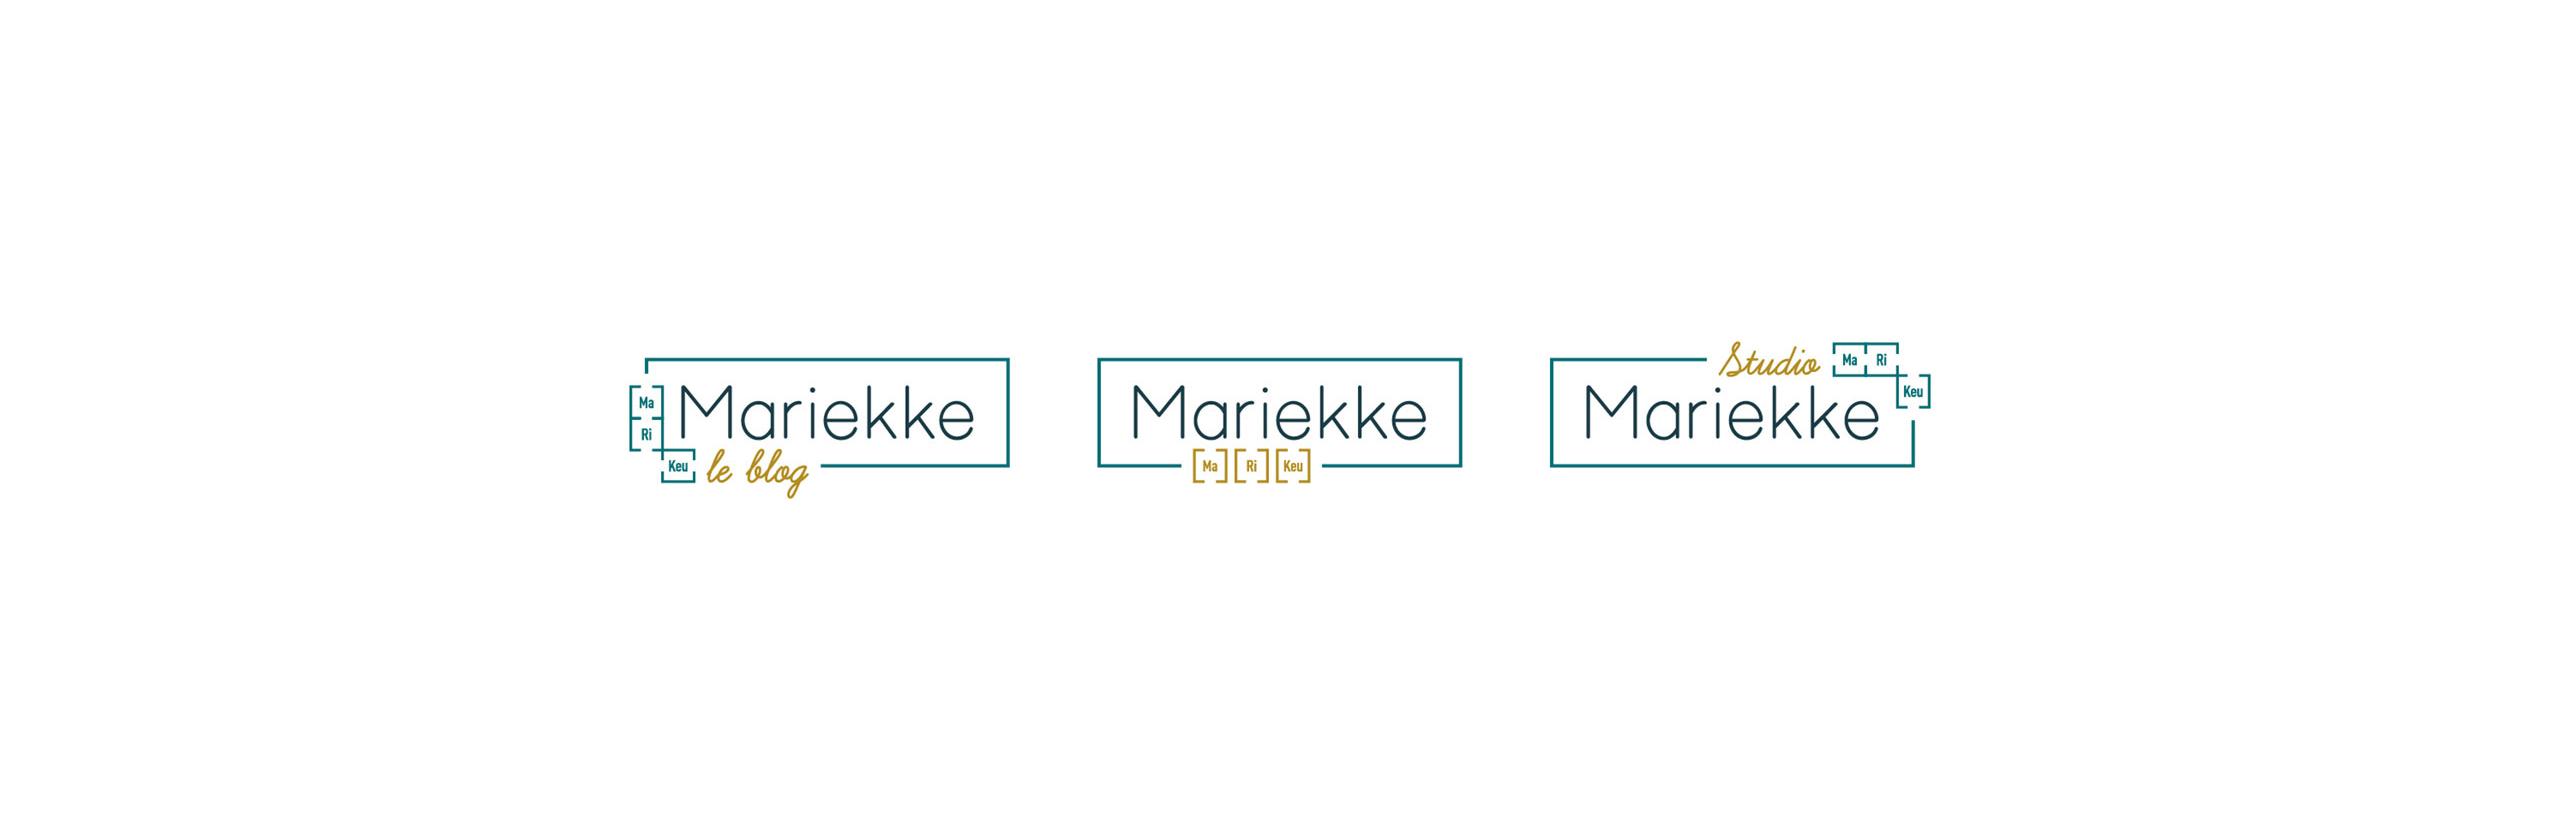 Mariekke-logos-OK